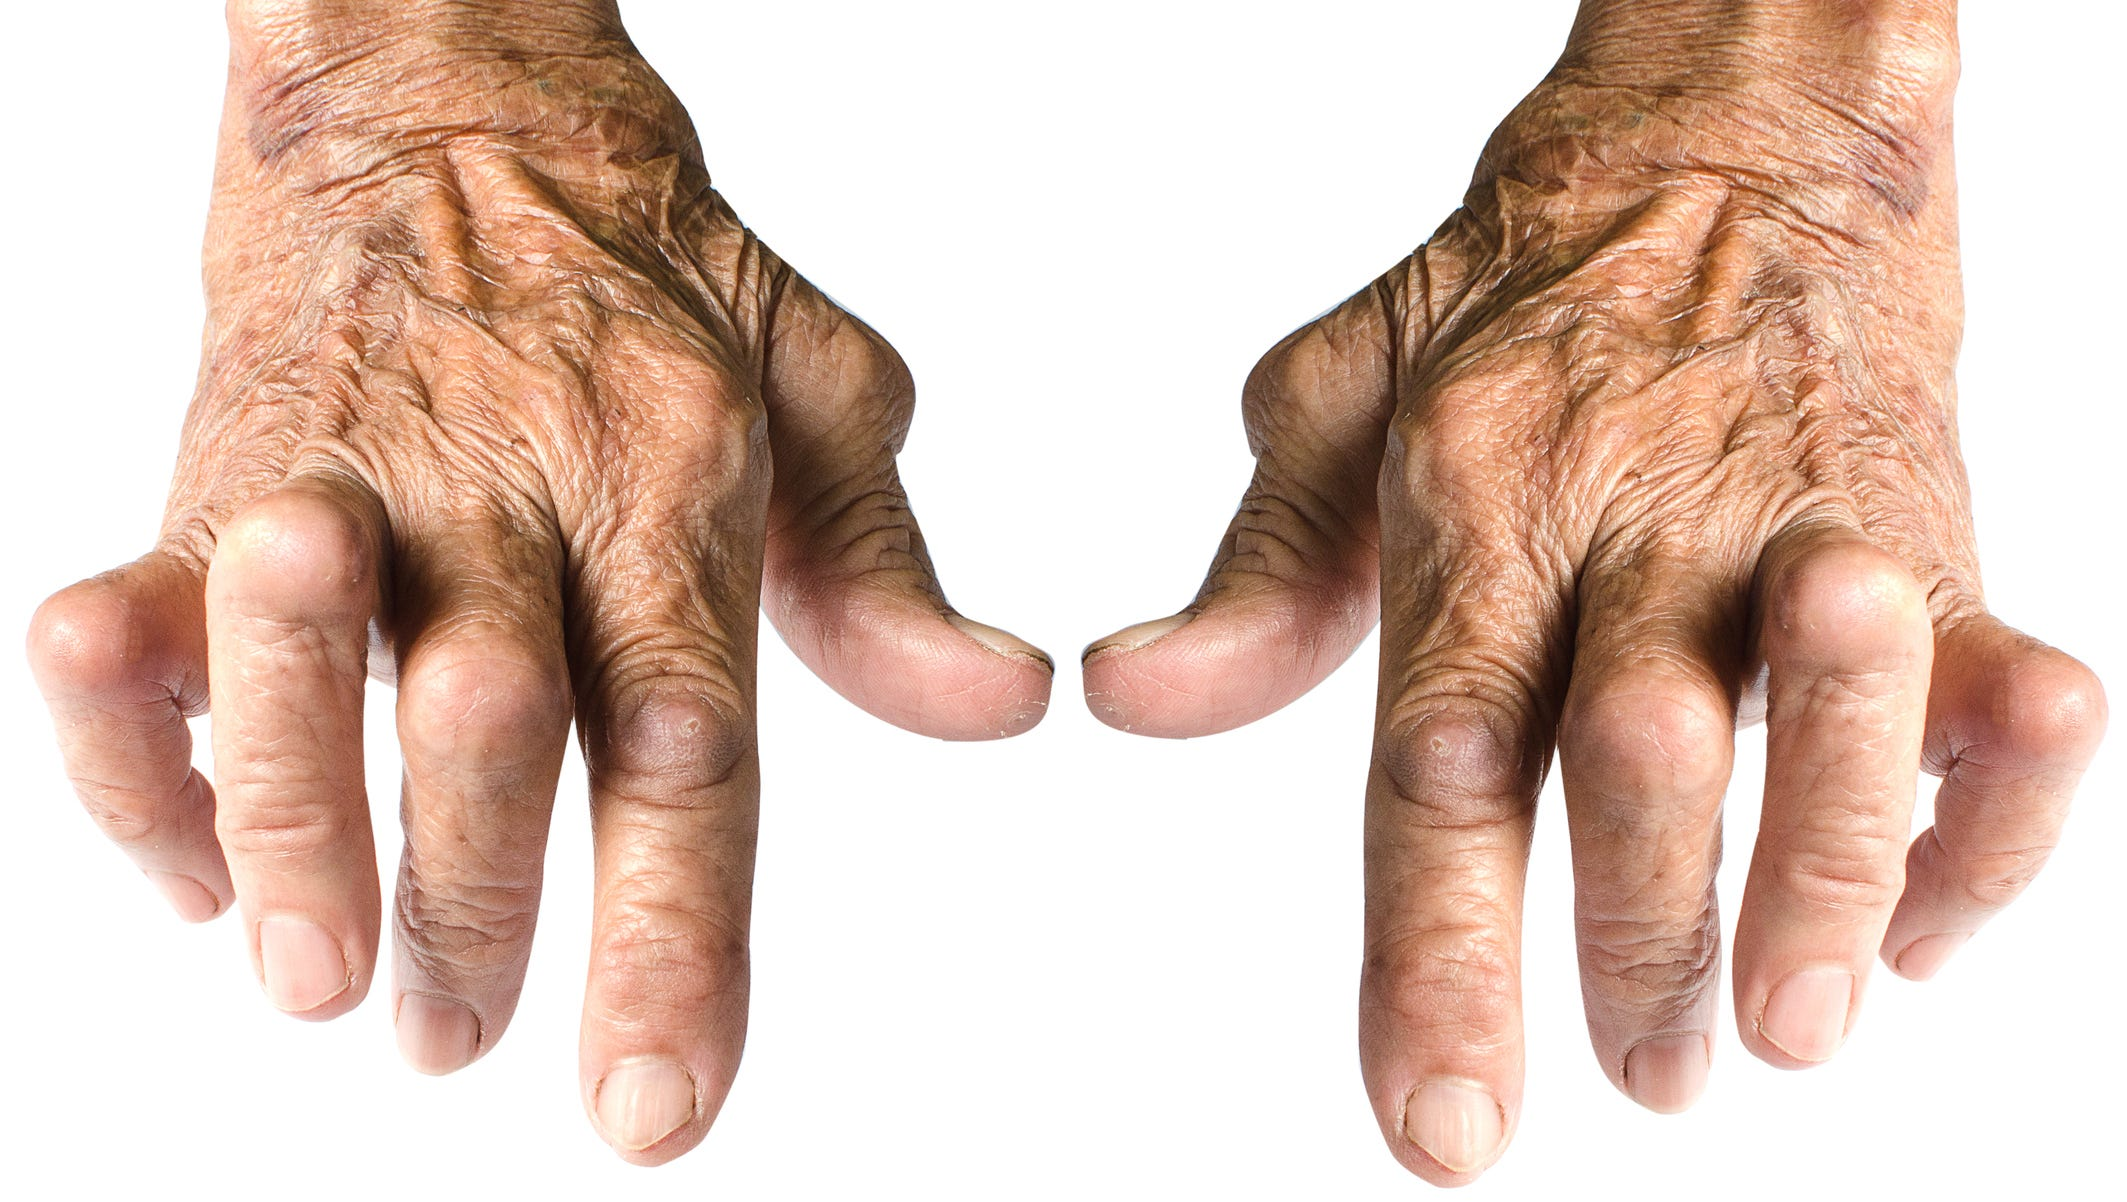 Over Time Rheumatoid Arthritis Can Lead To Deformities